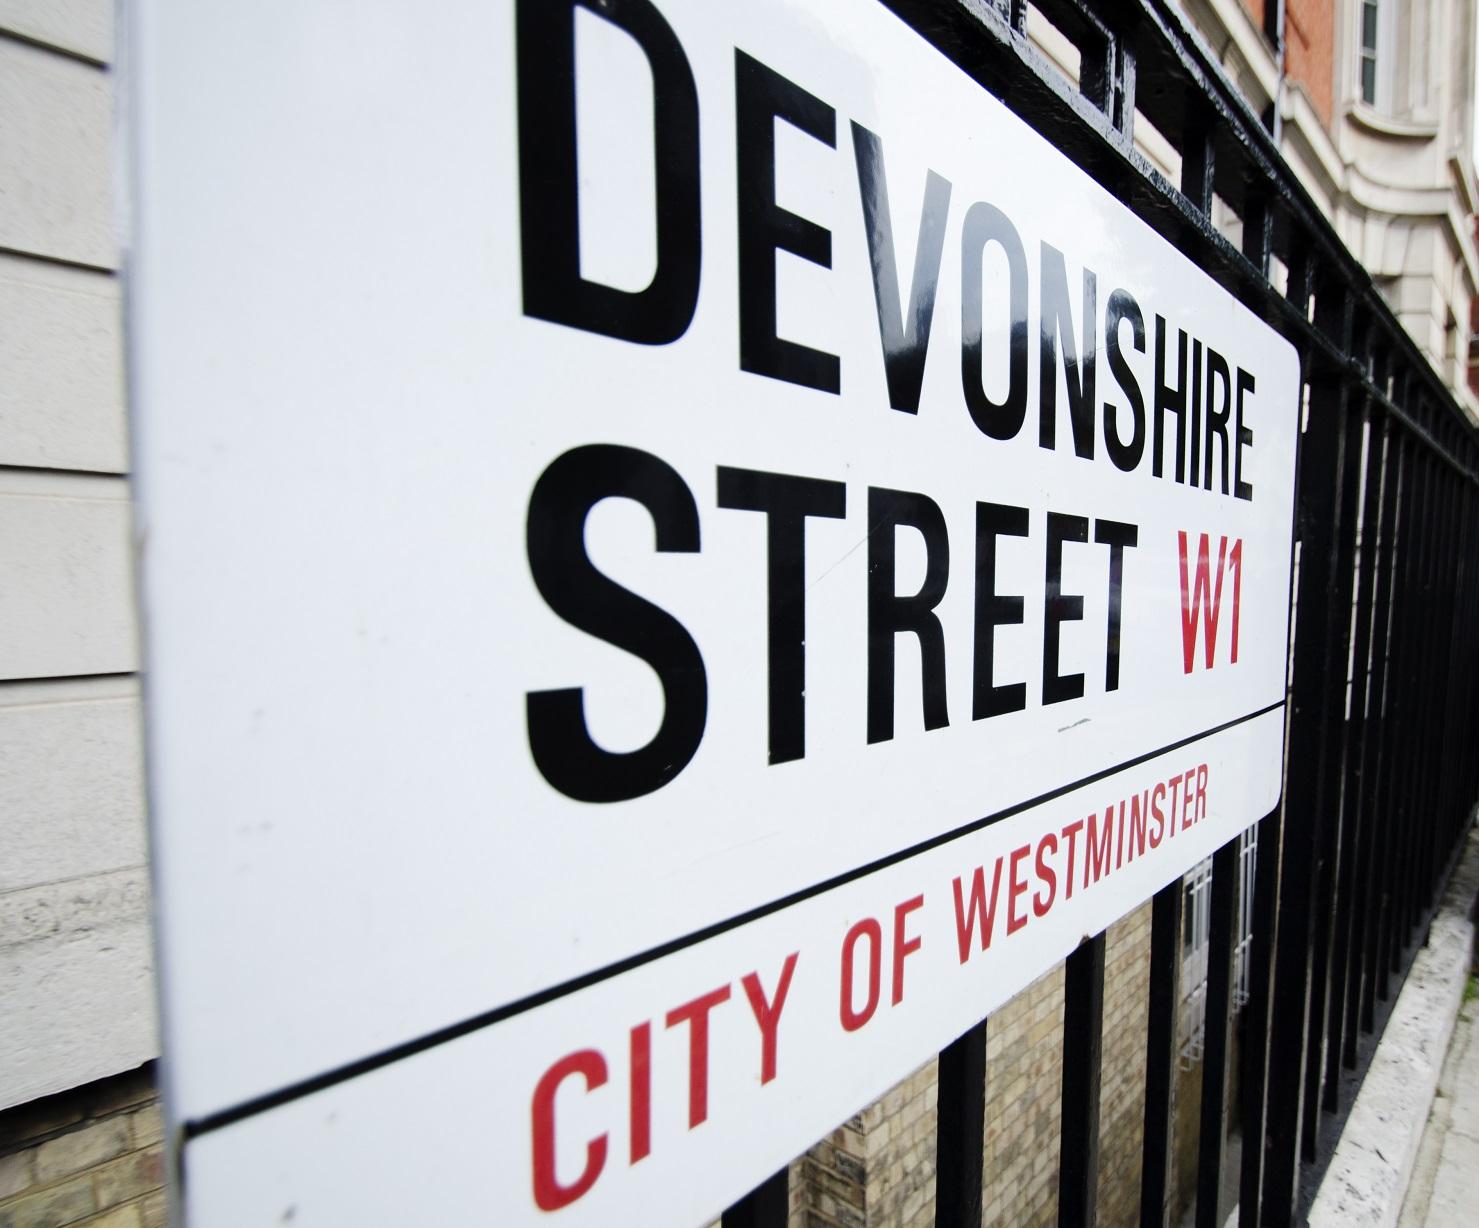 Devonshire St